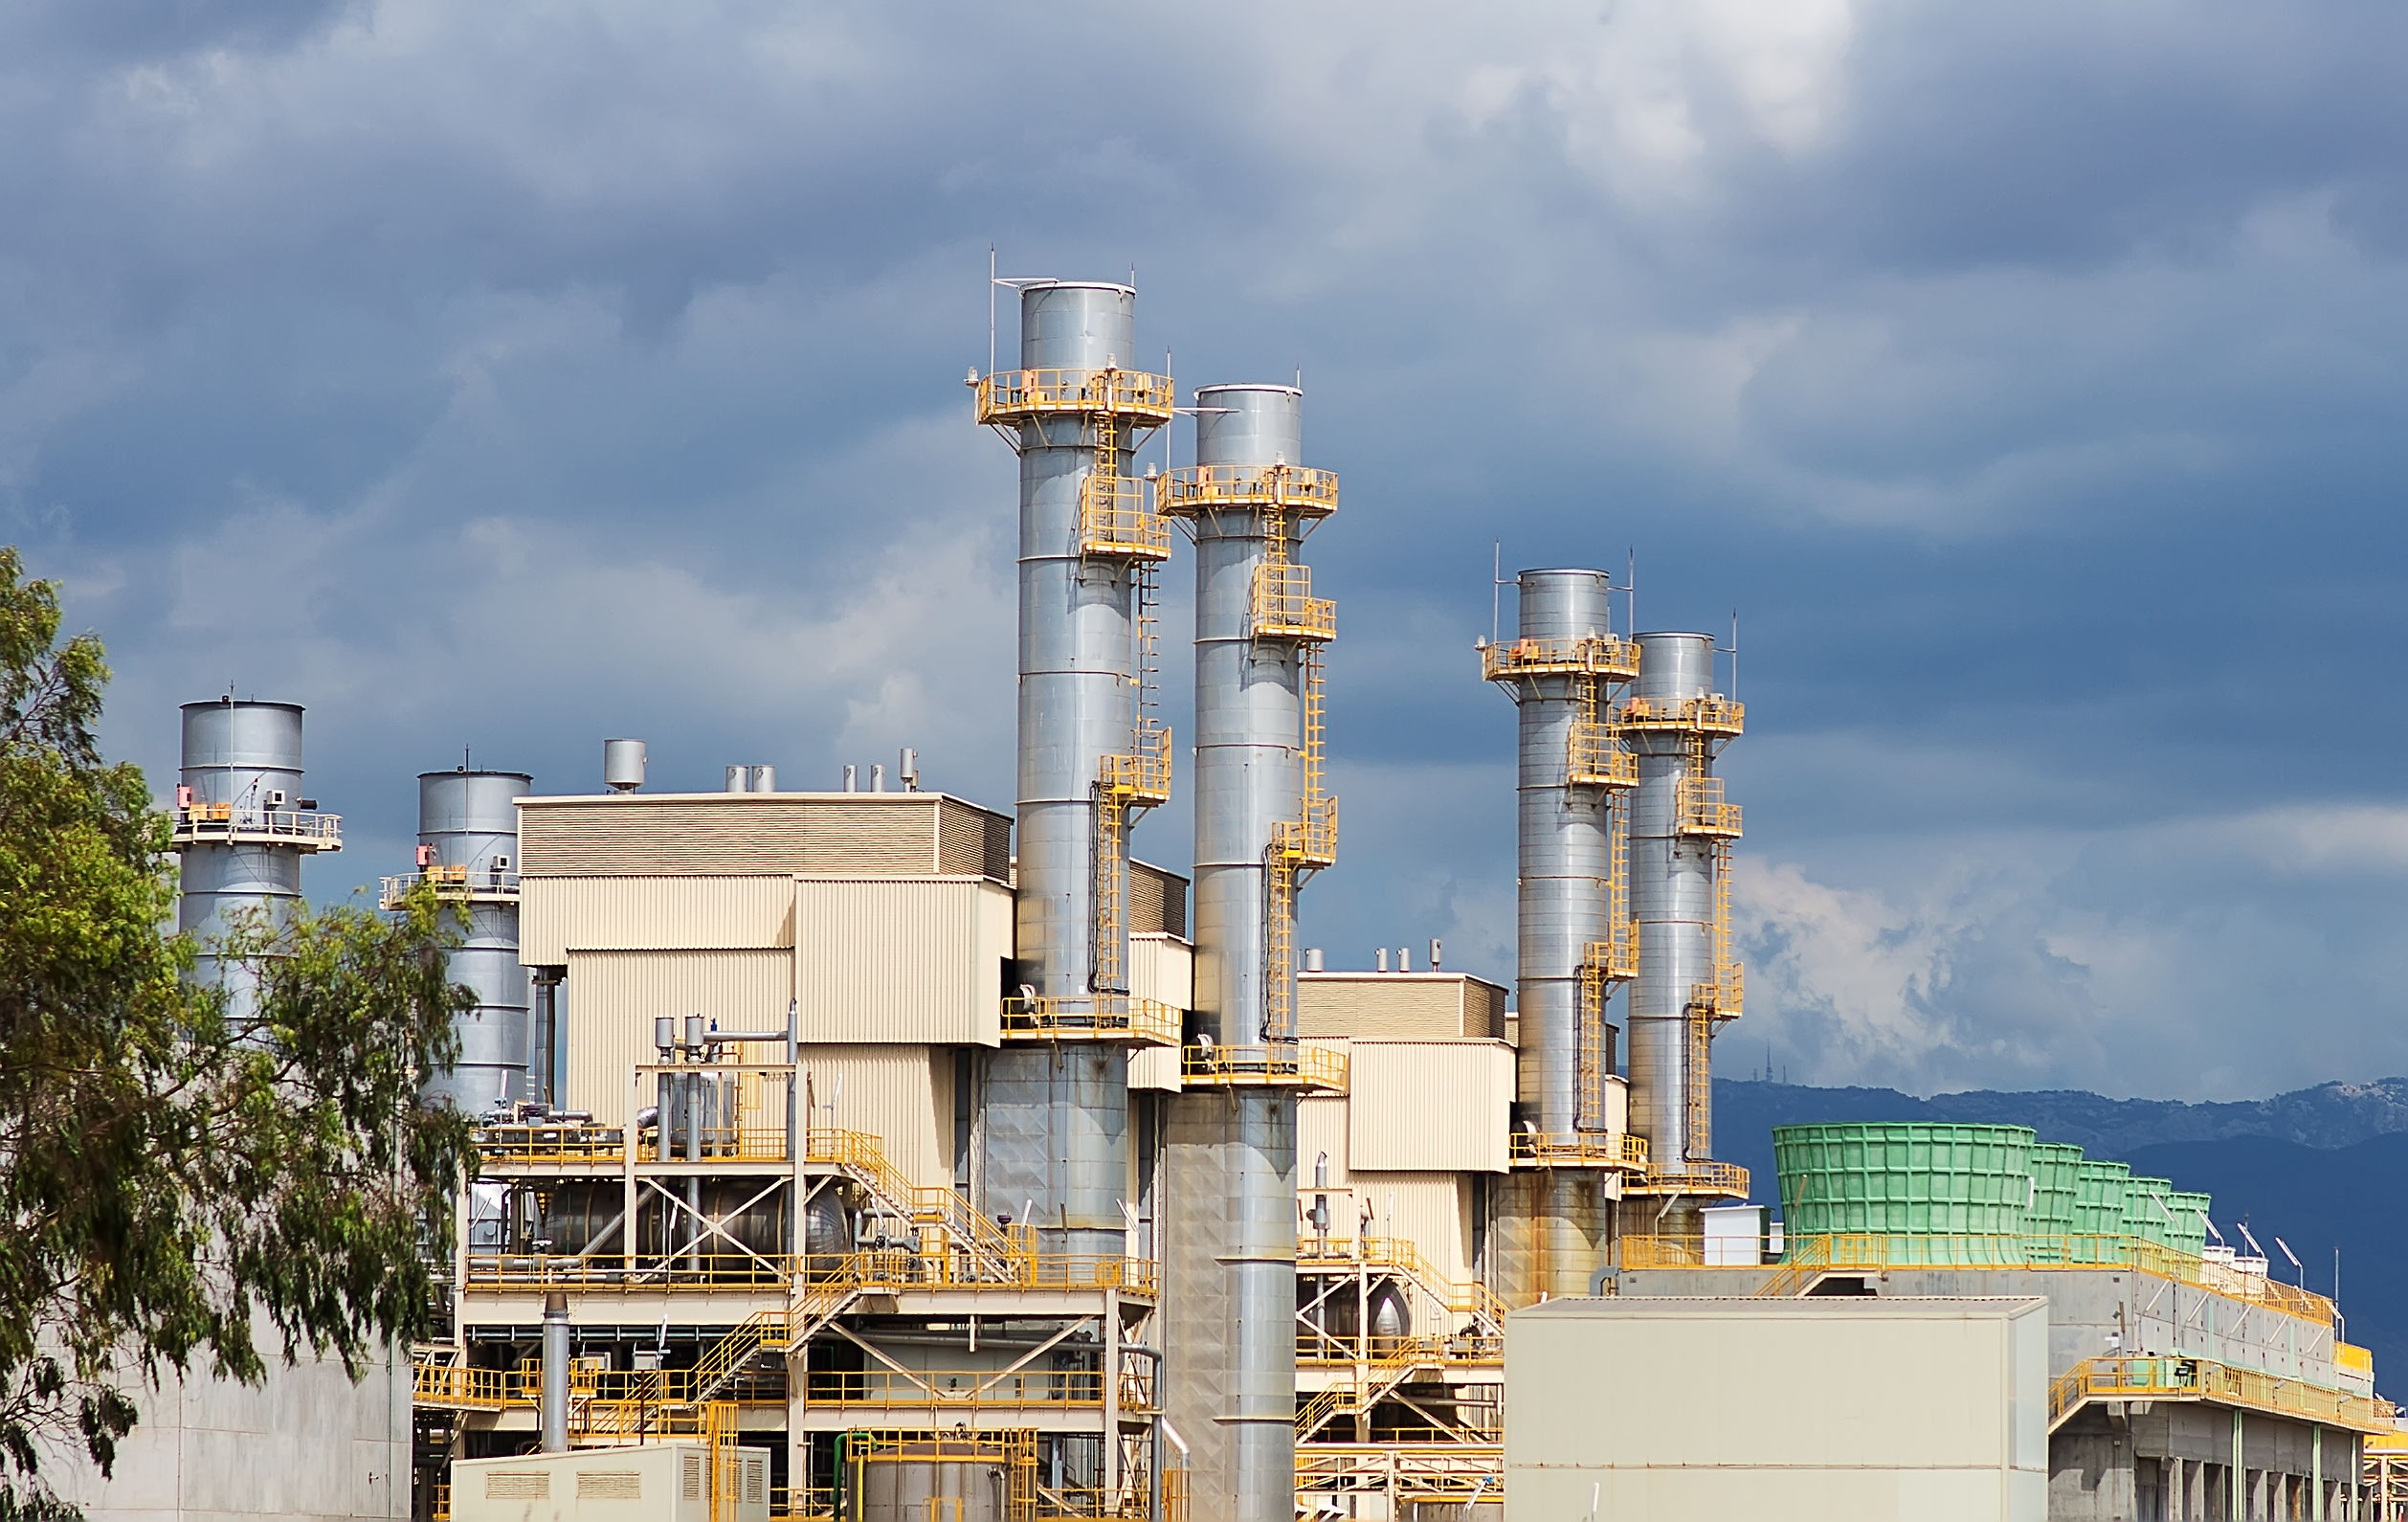 Hazardous waste disposal at an incineration plant